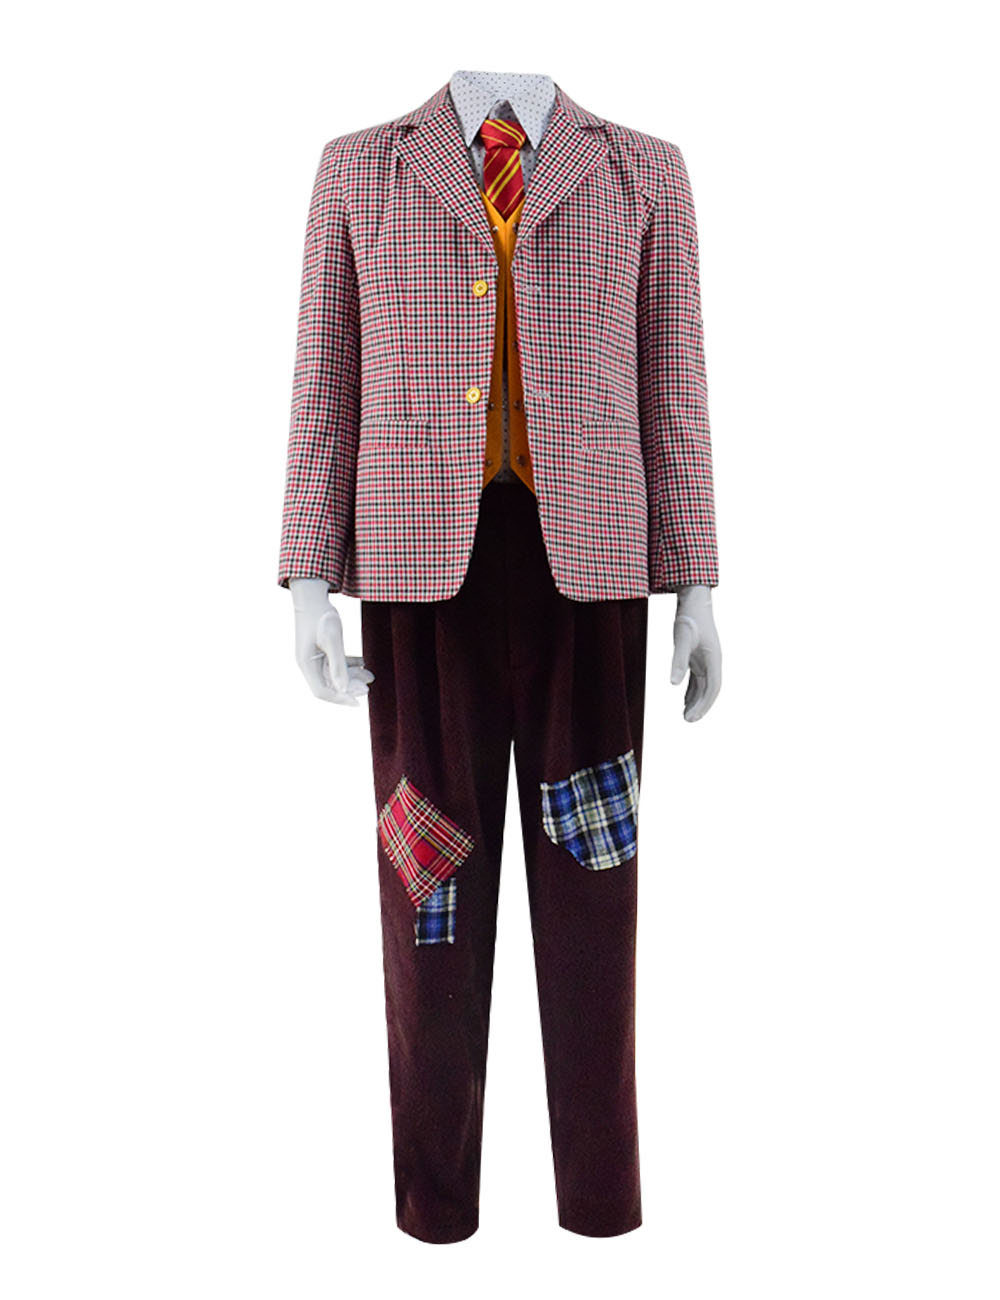 Joker 2019 Arthur Fleck Cosplay Costume Checkered Plaid Blazer Suit Full Set